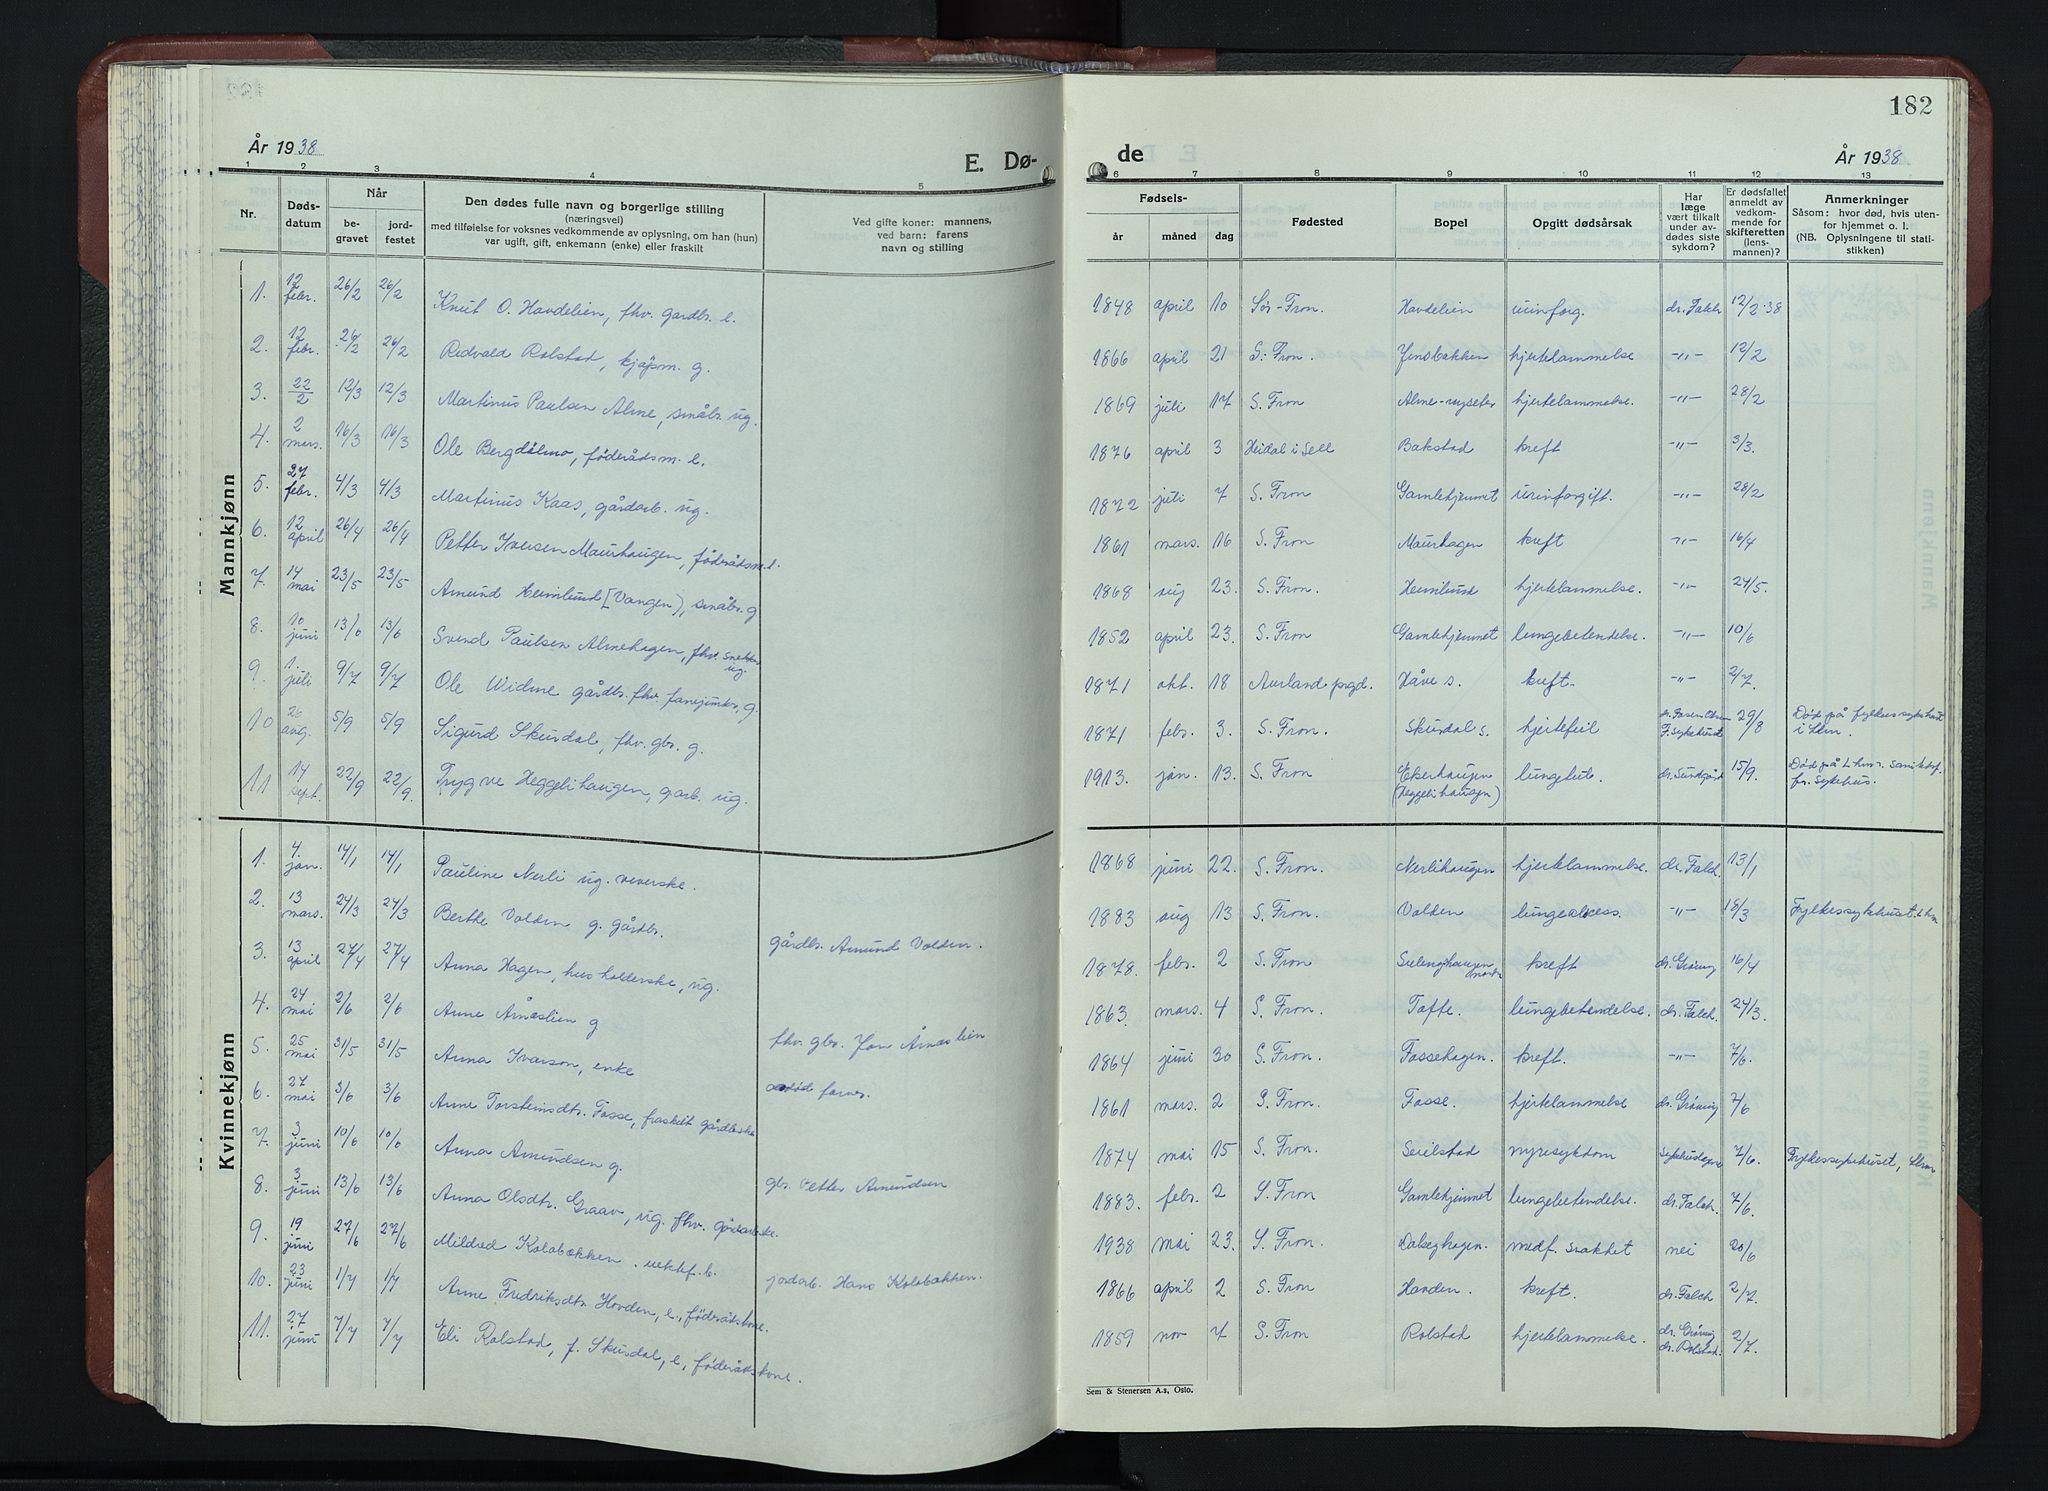 SAH, Sør-Fron prestekontor, H/Ha/Hab/L0006: Klokkerbok nr. 6, 1933-1948, s. 182